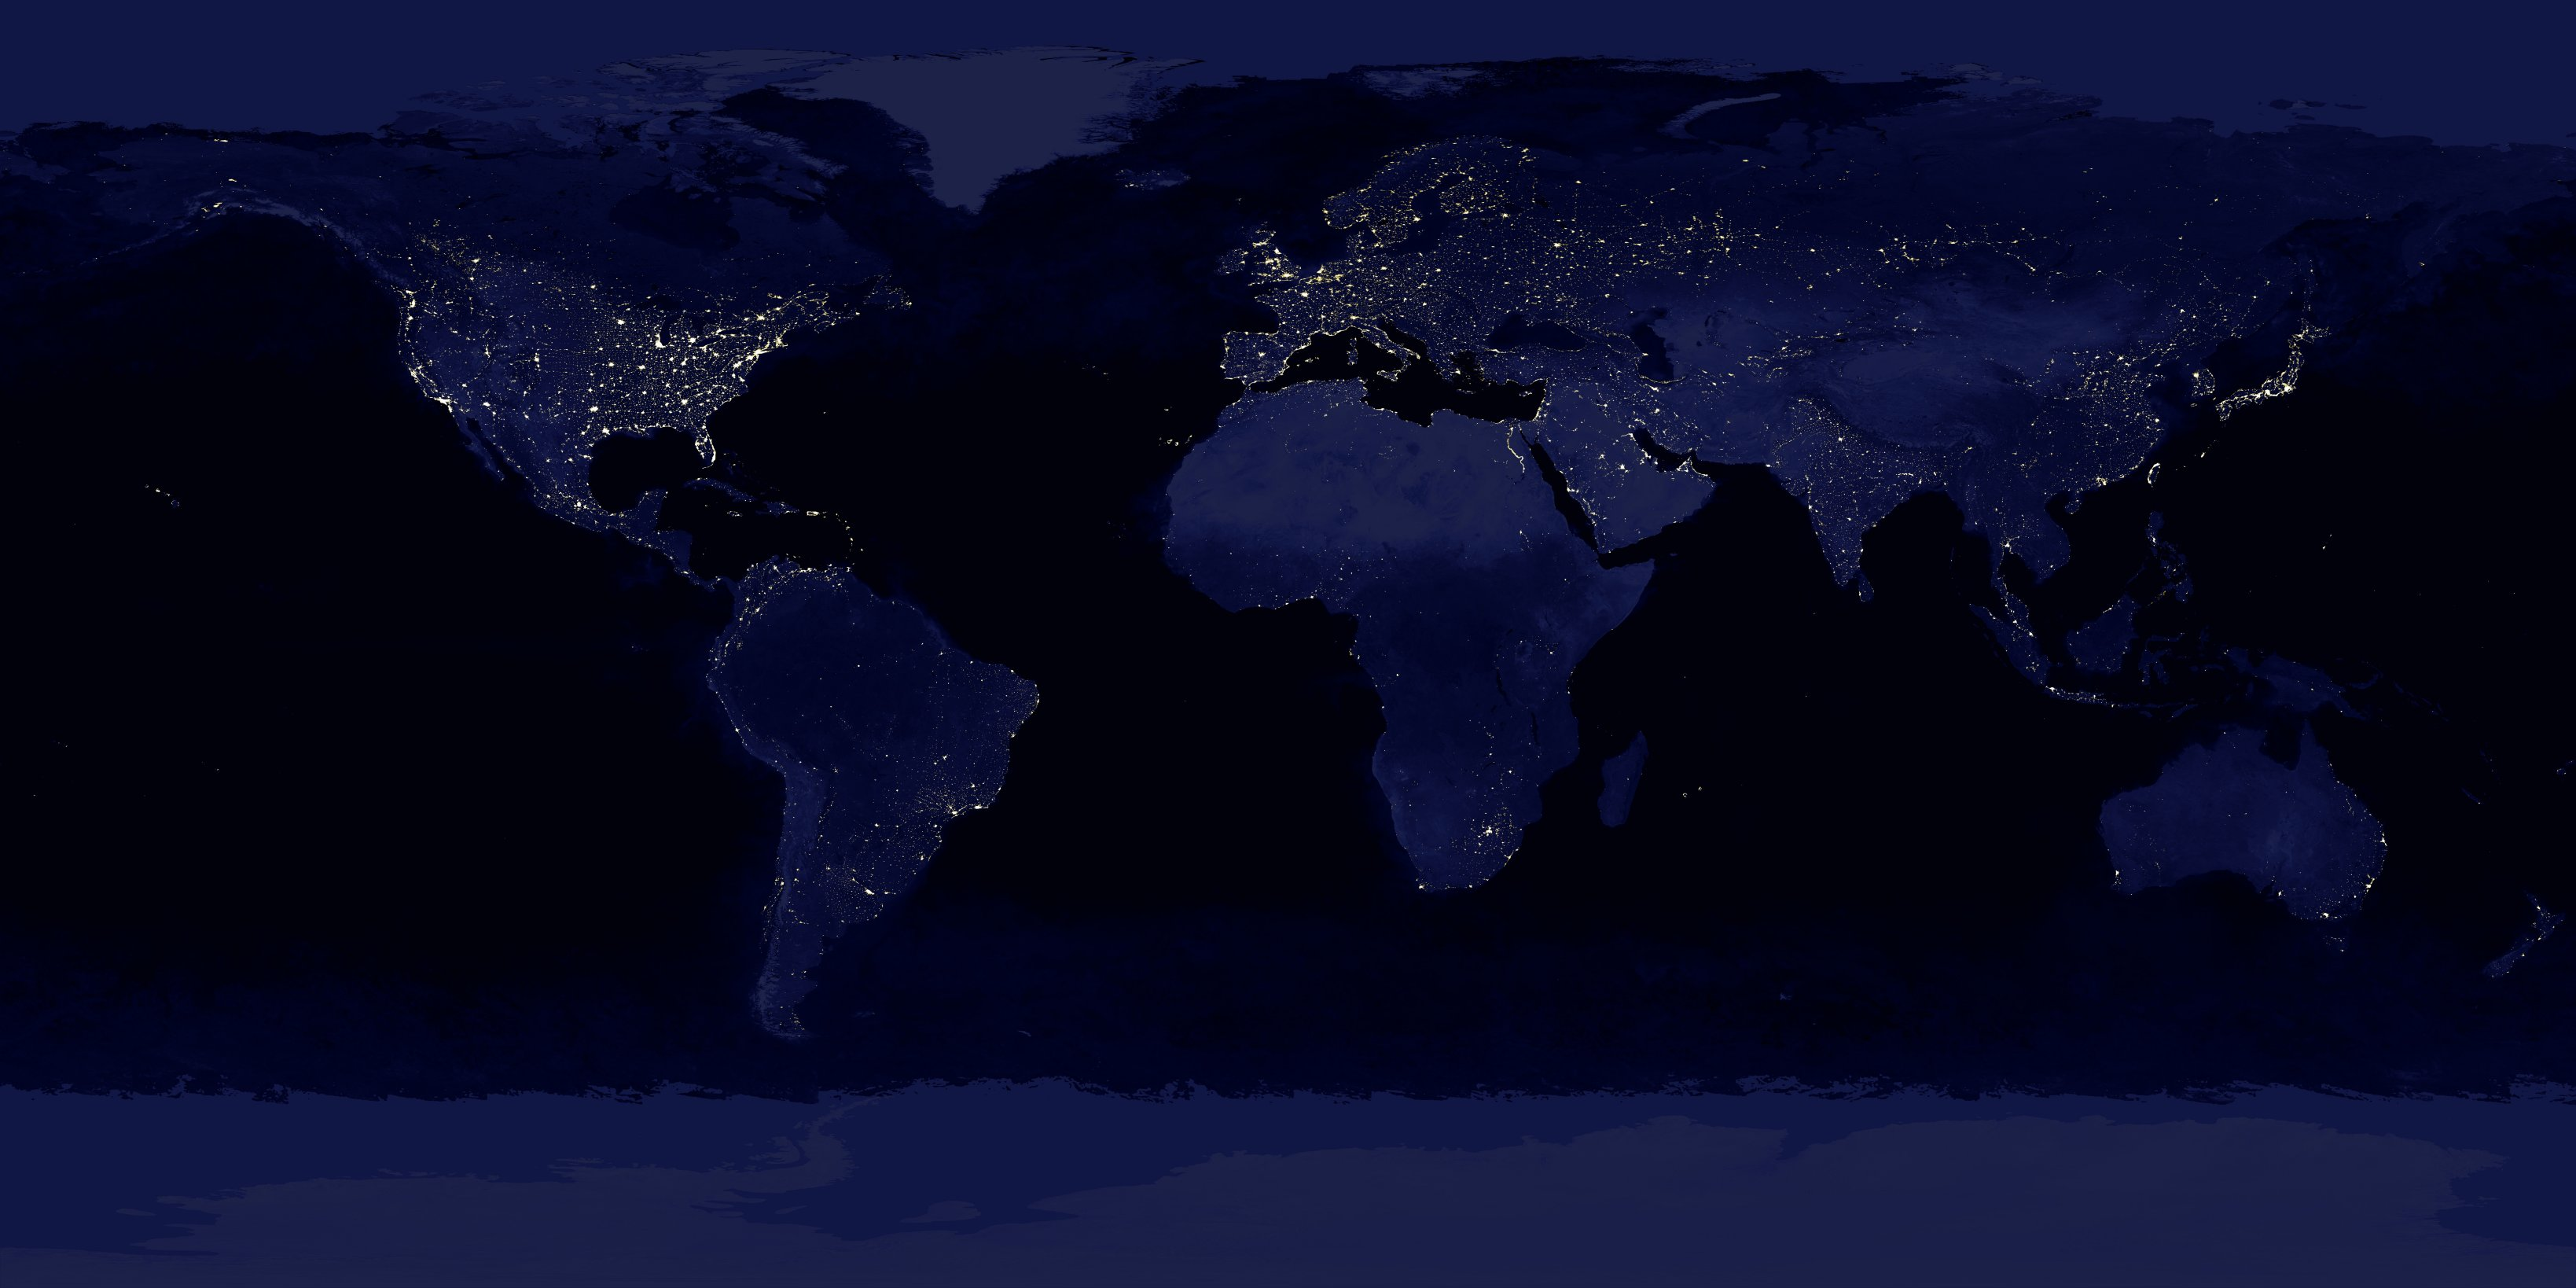 FunMozar Earth Wallpapers From NASA 3277x1638